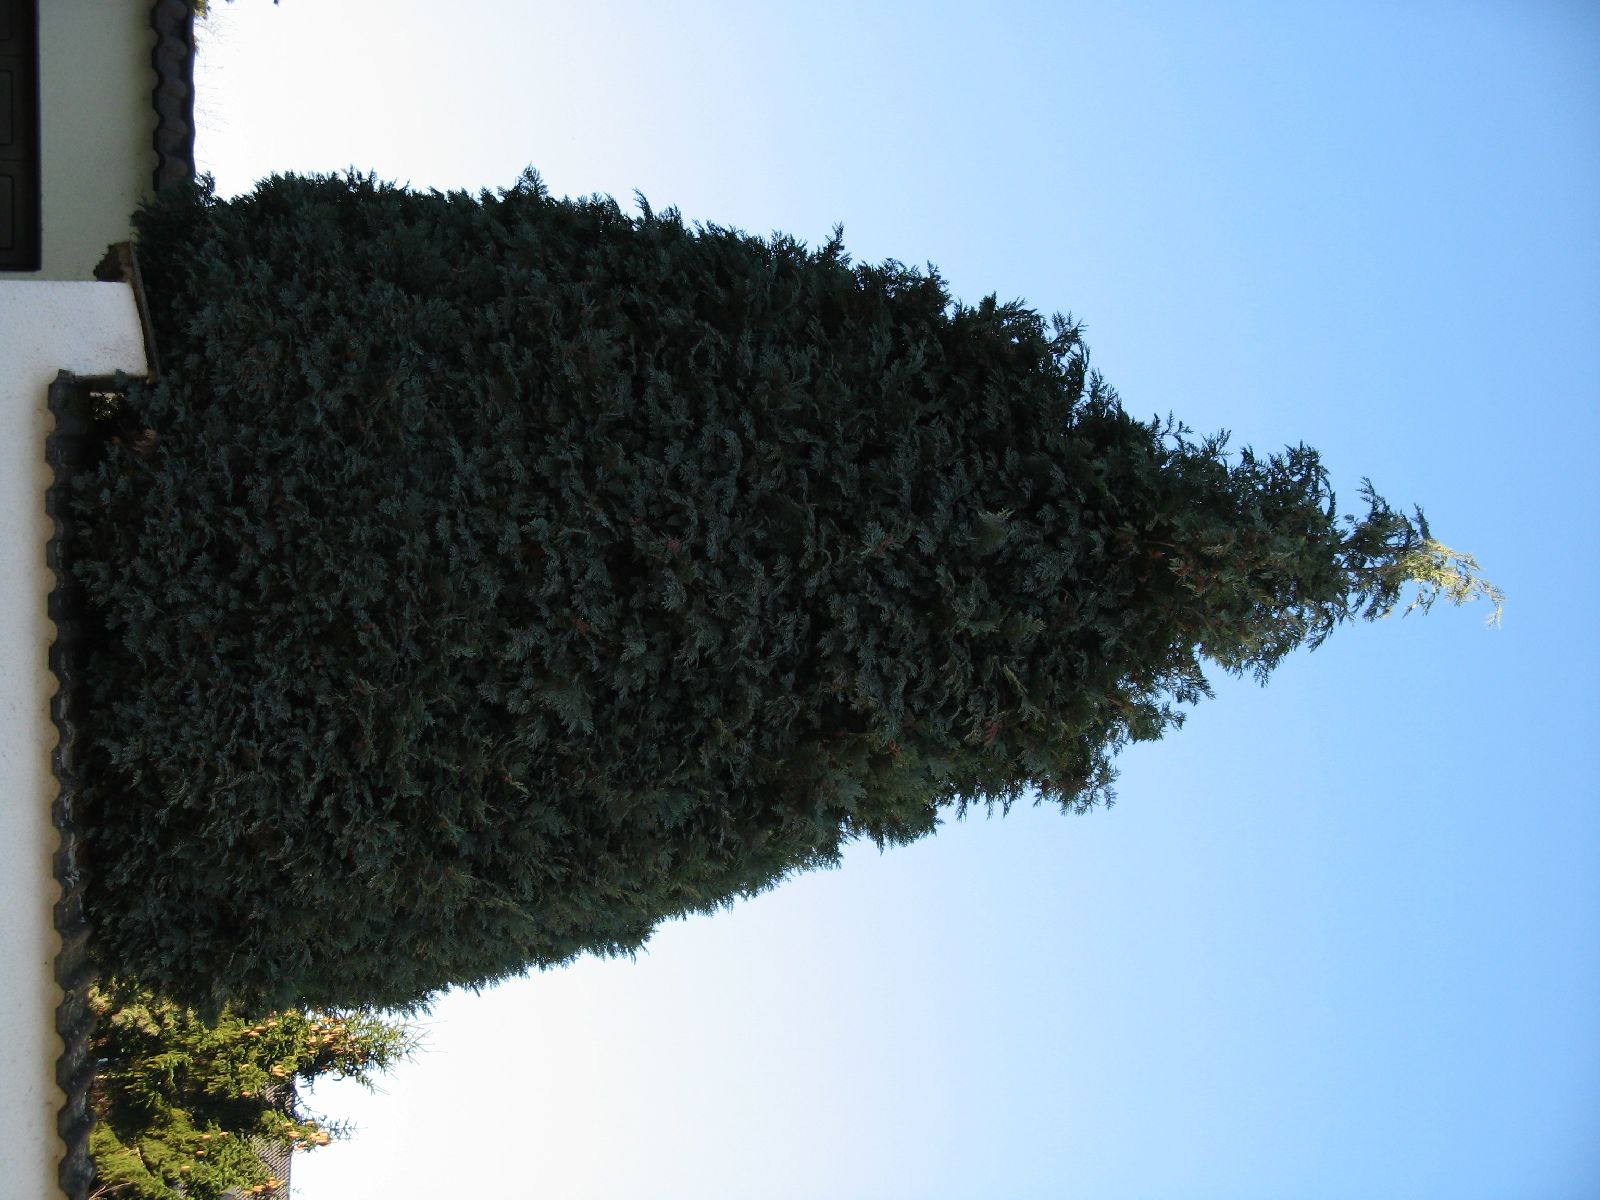 Plants-Trees_Photo_Texture_B_42430